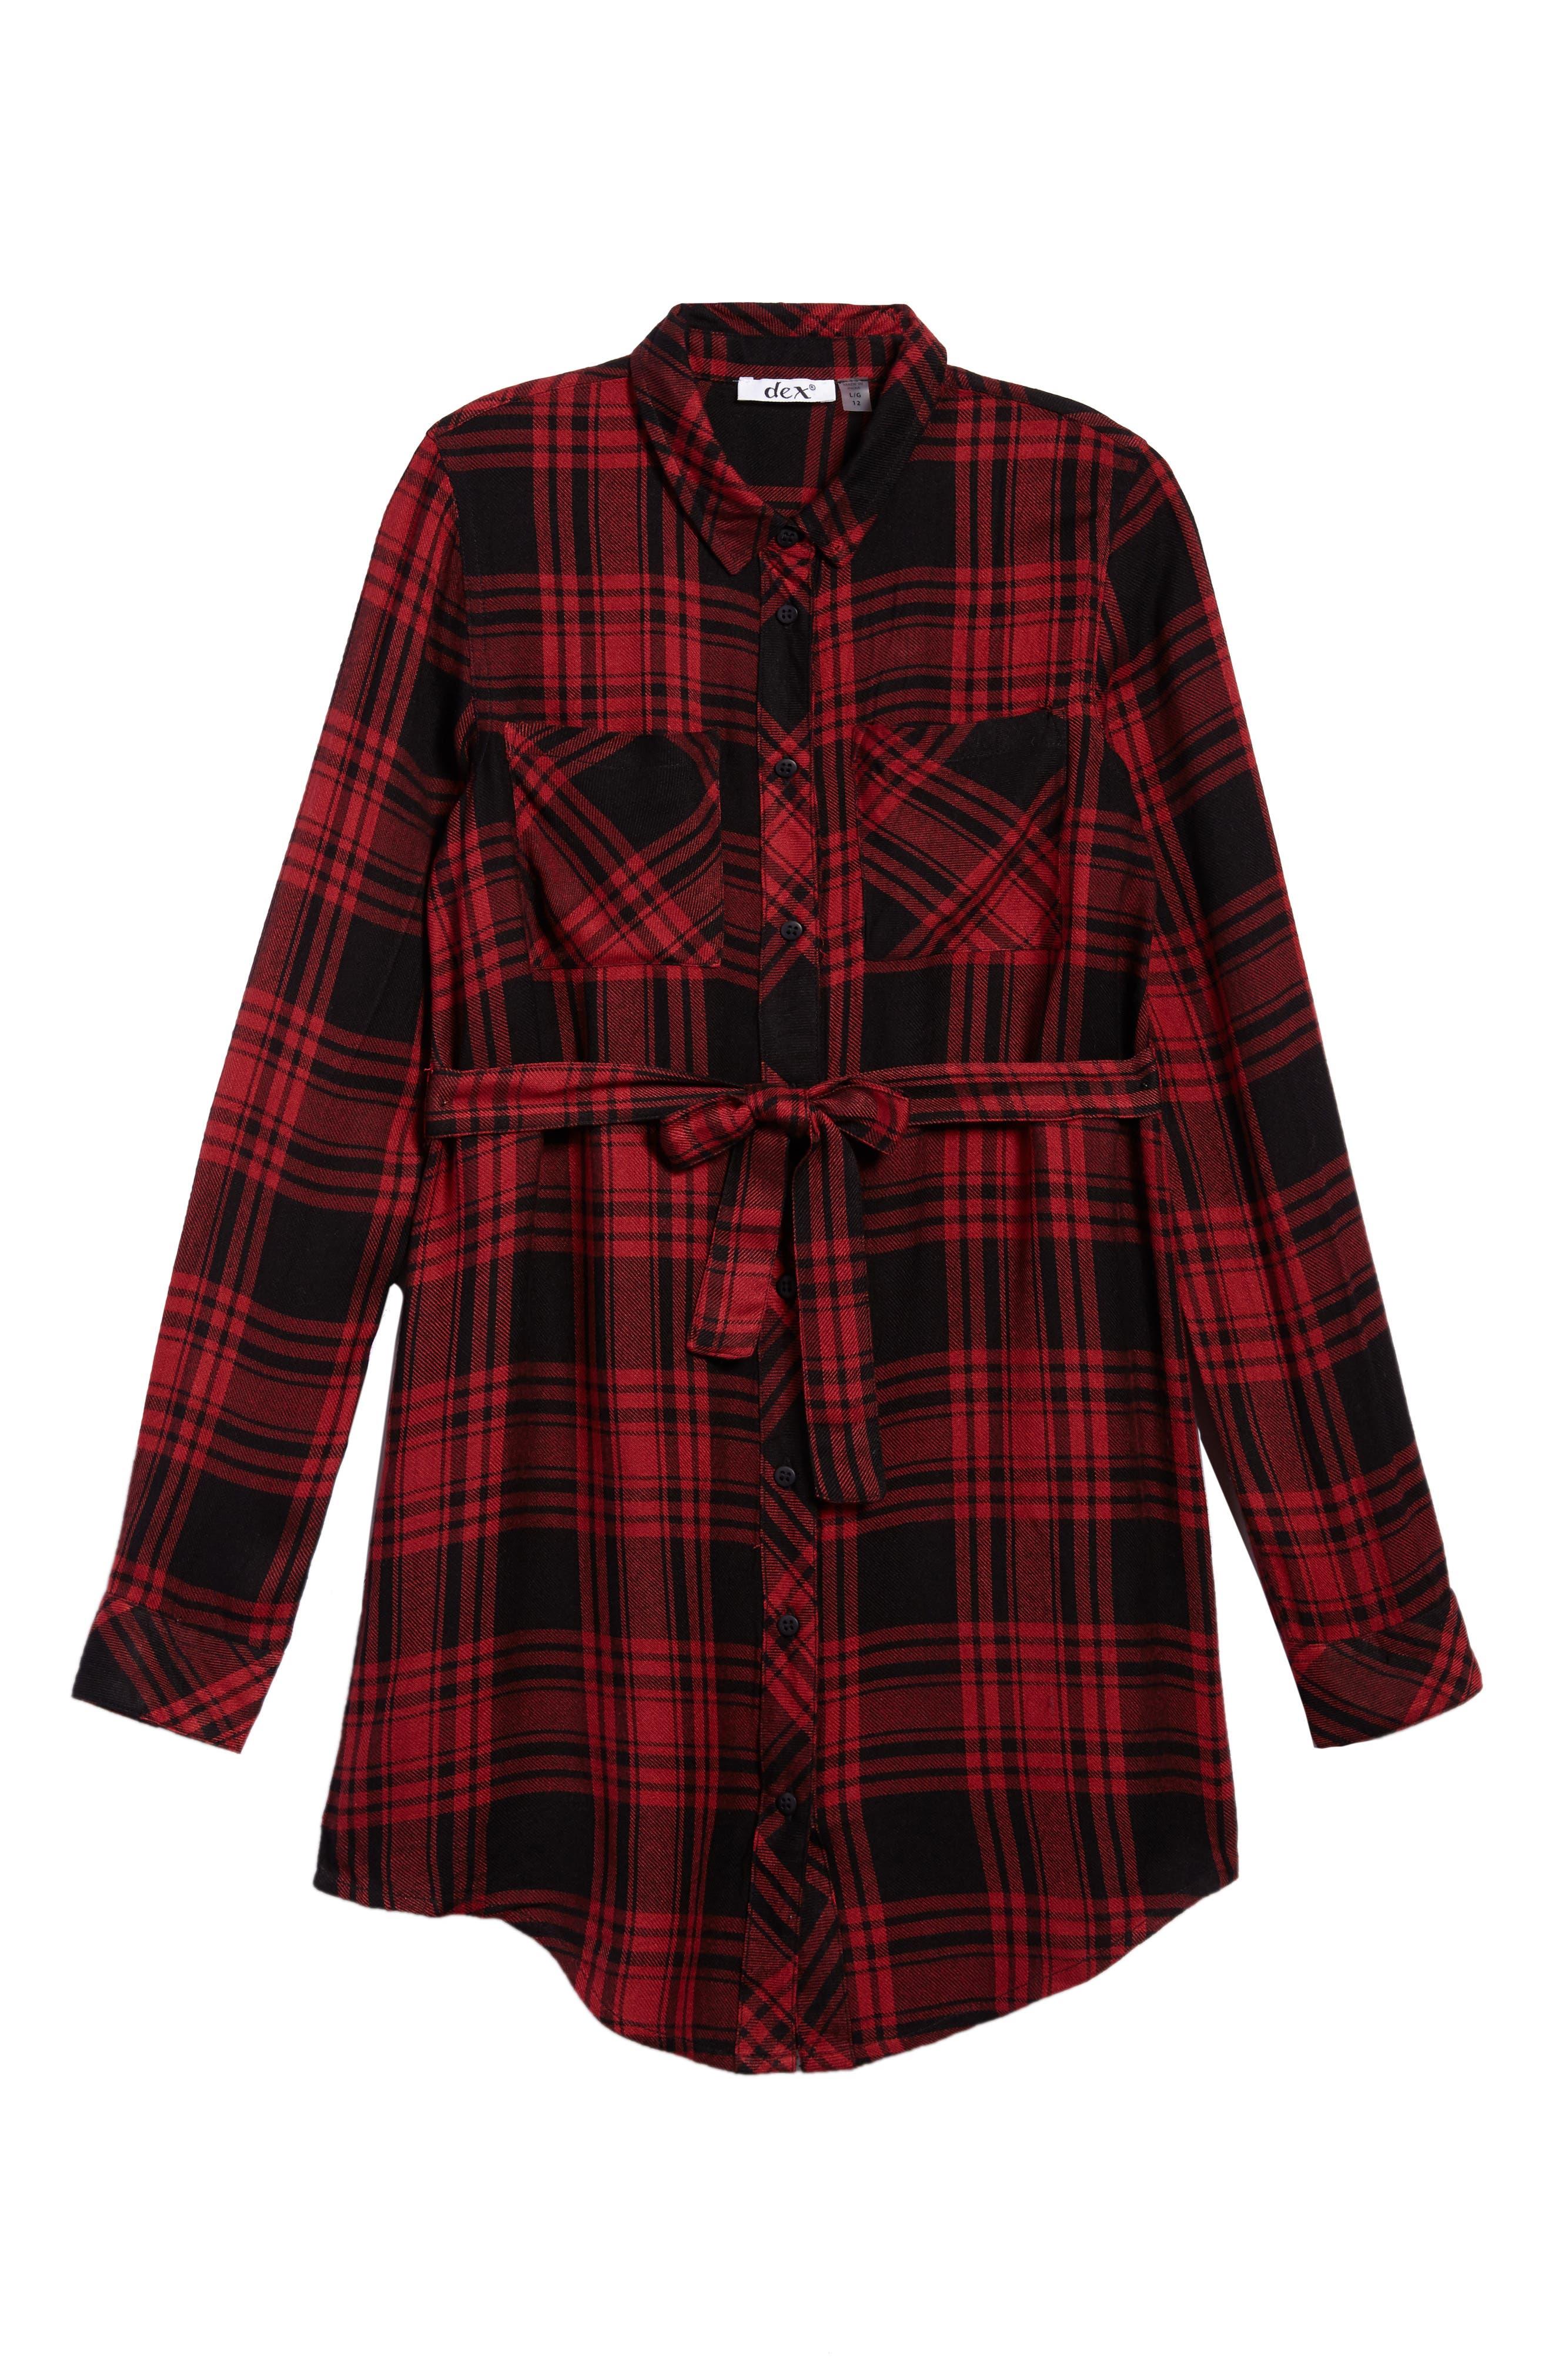 Belted Plaid Dress,                         Main,                         color, Scarlett Red/ Black Plaid